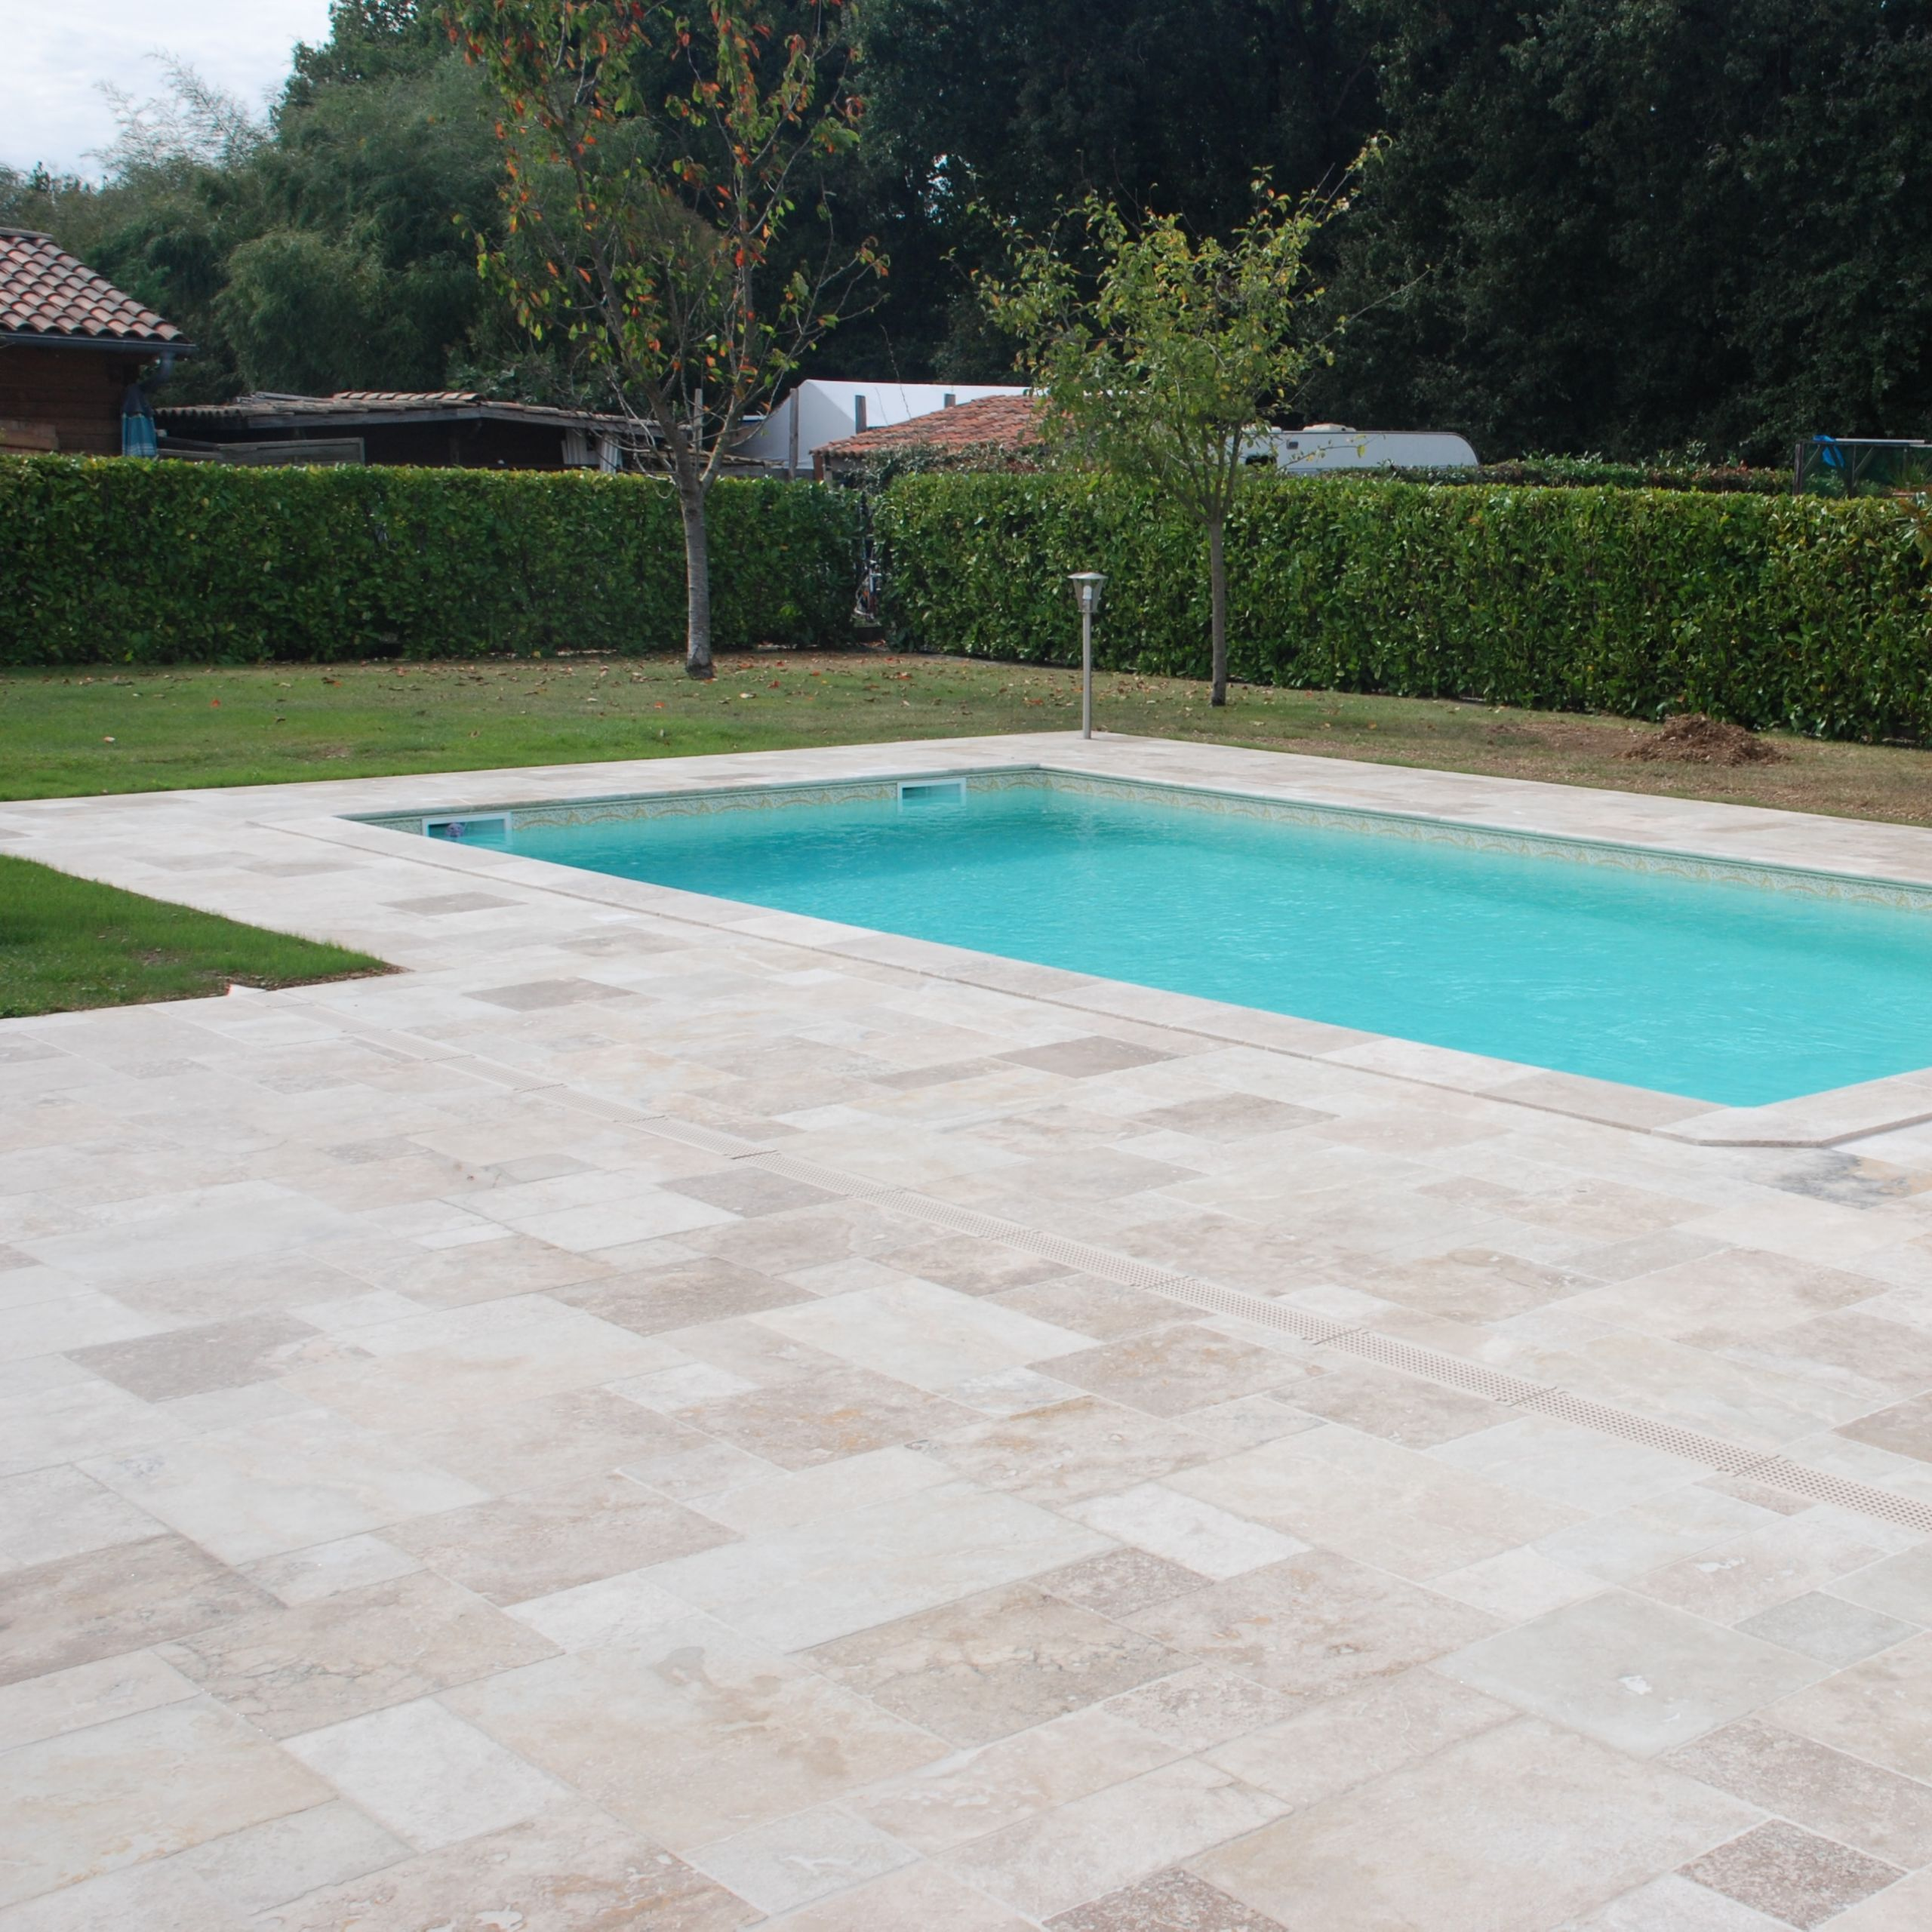 Terrasse travertin RUSTIC avec margelles de piscine